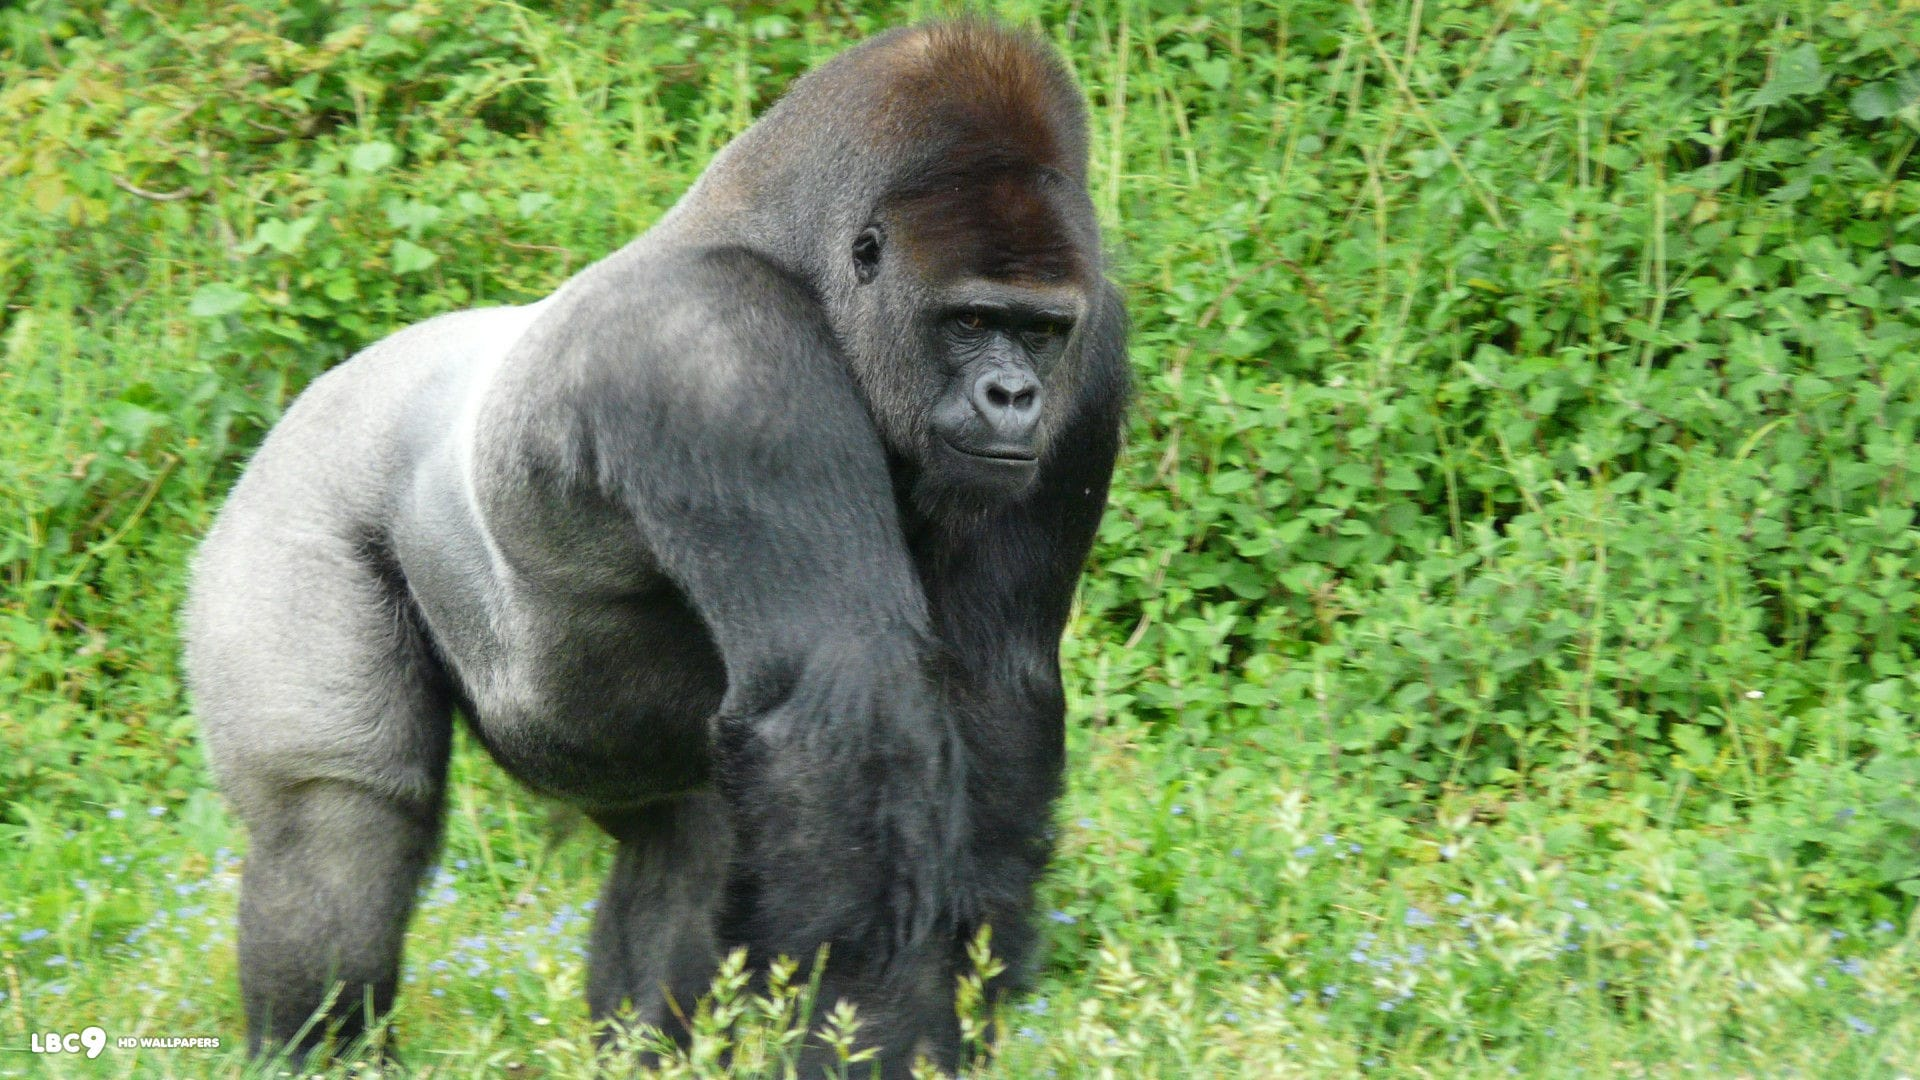 Gorilla HD